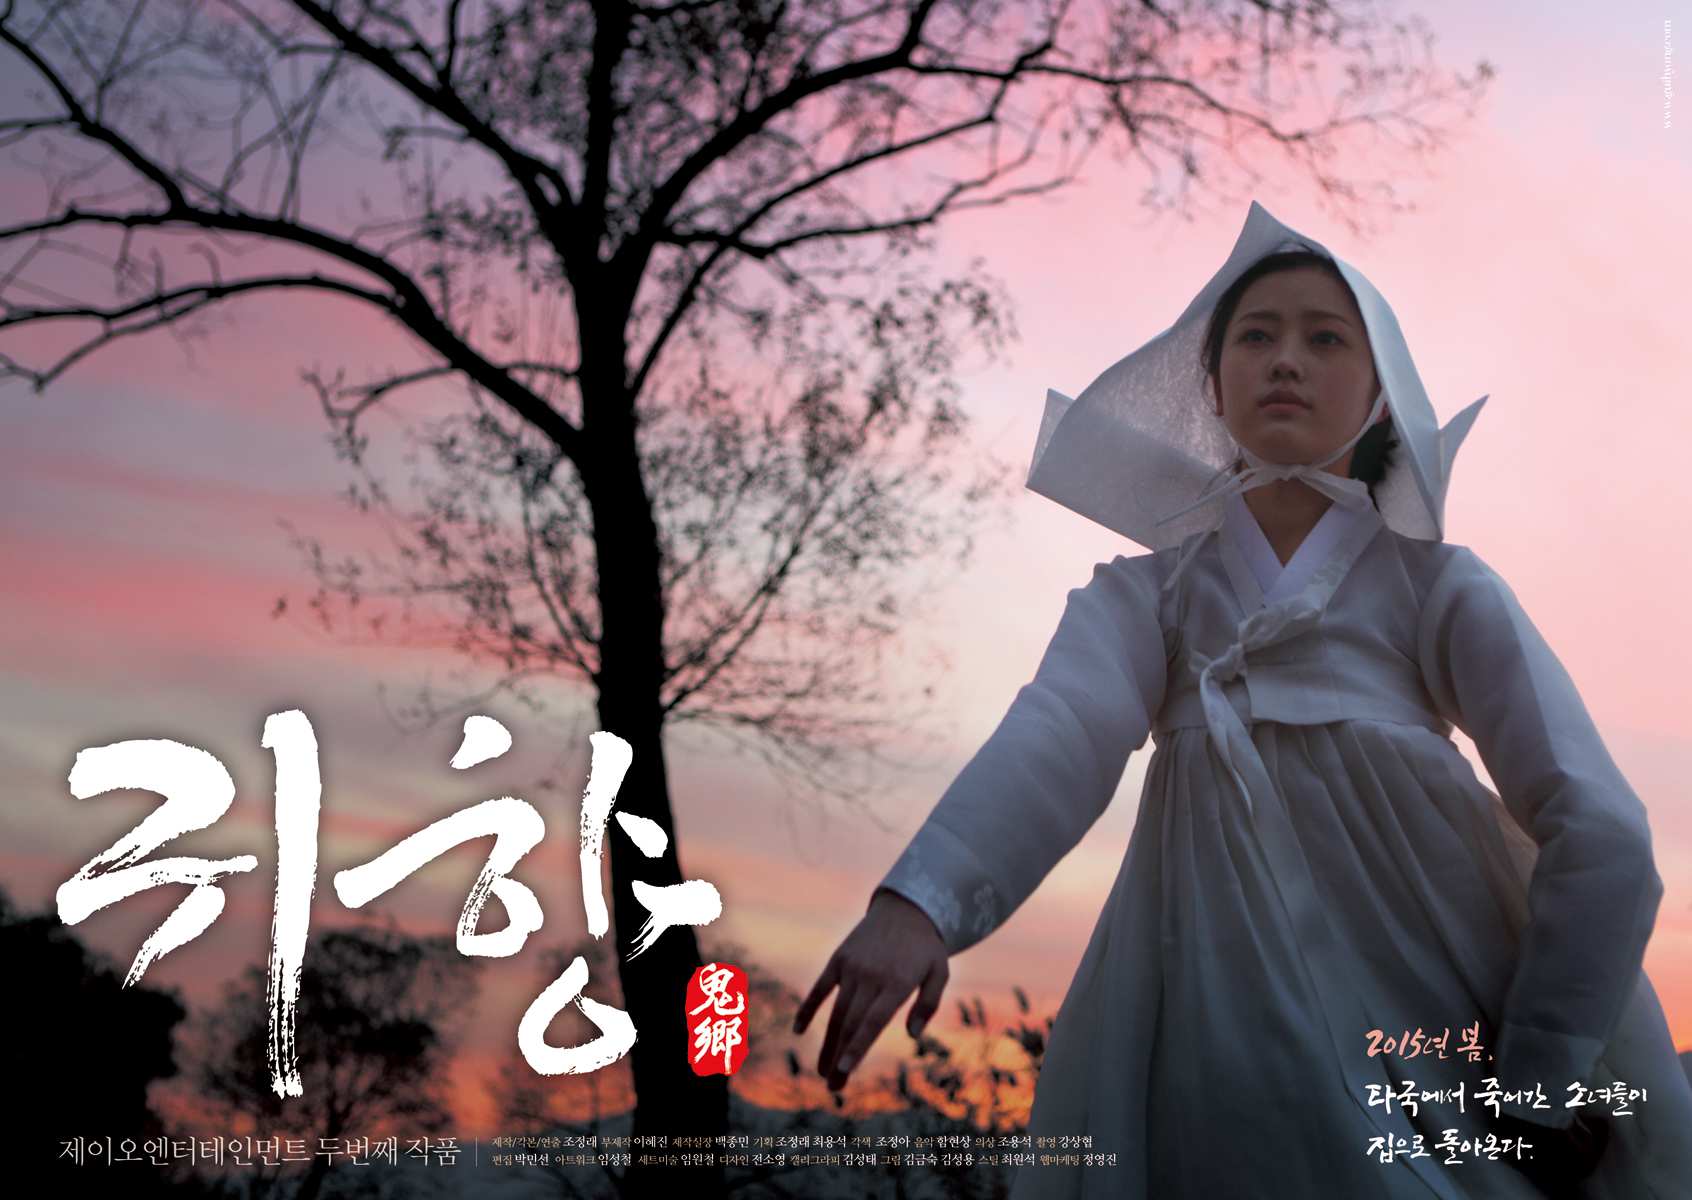 [News] 2015년 개봉 예정작 '귀향'